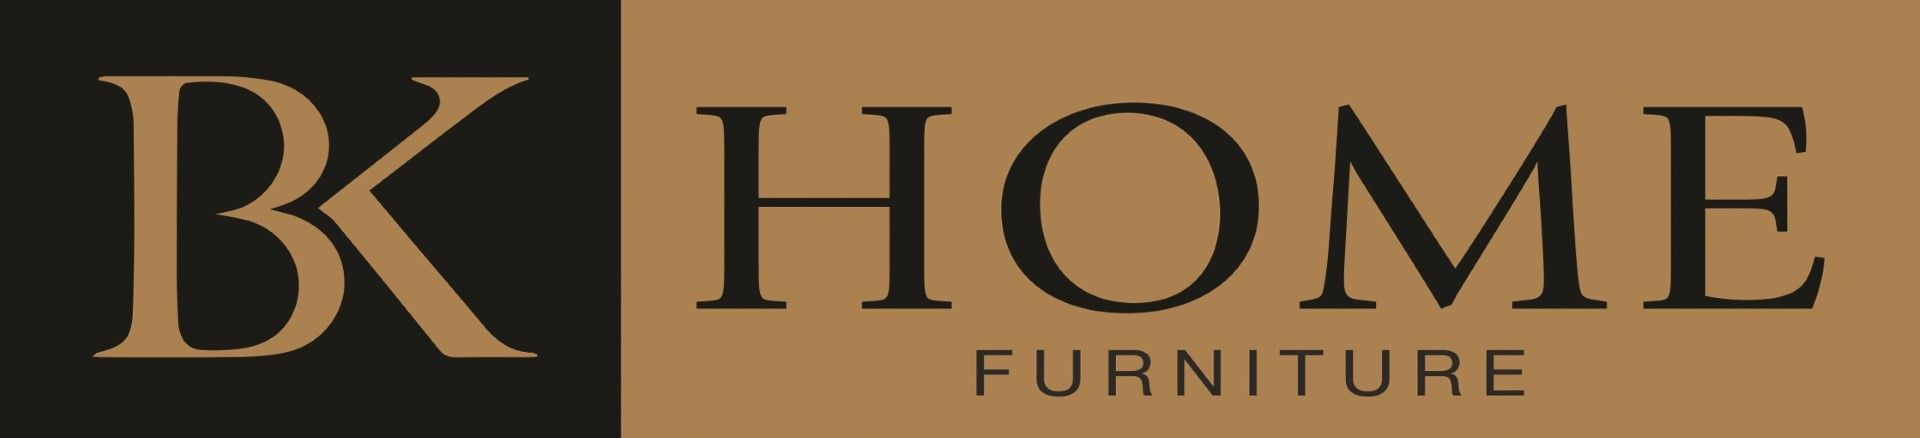 BK Home Furniture